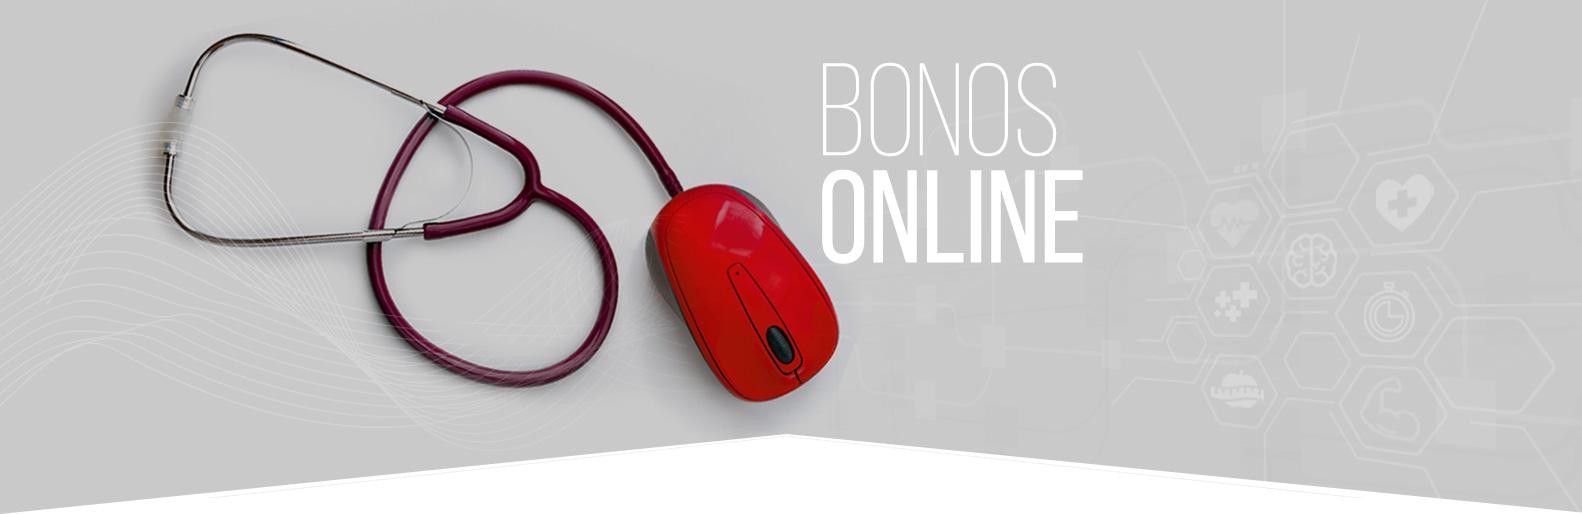 Bonos Online